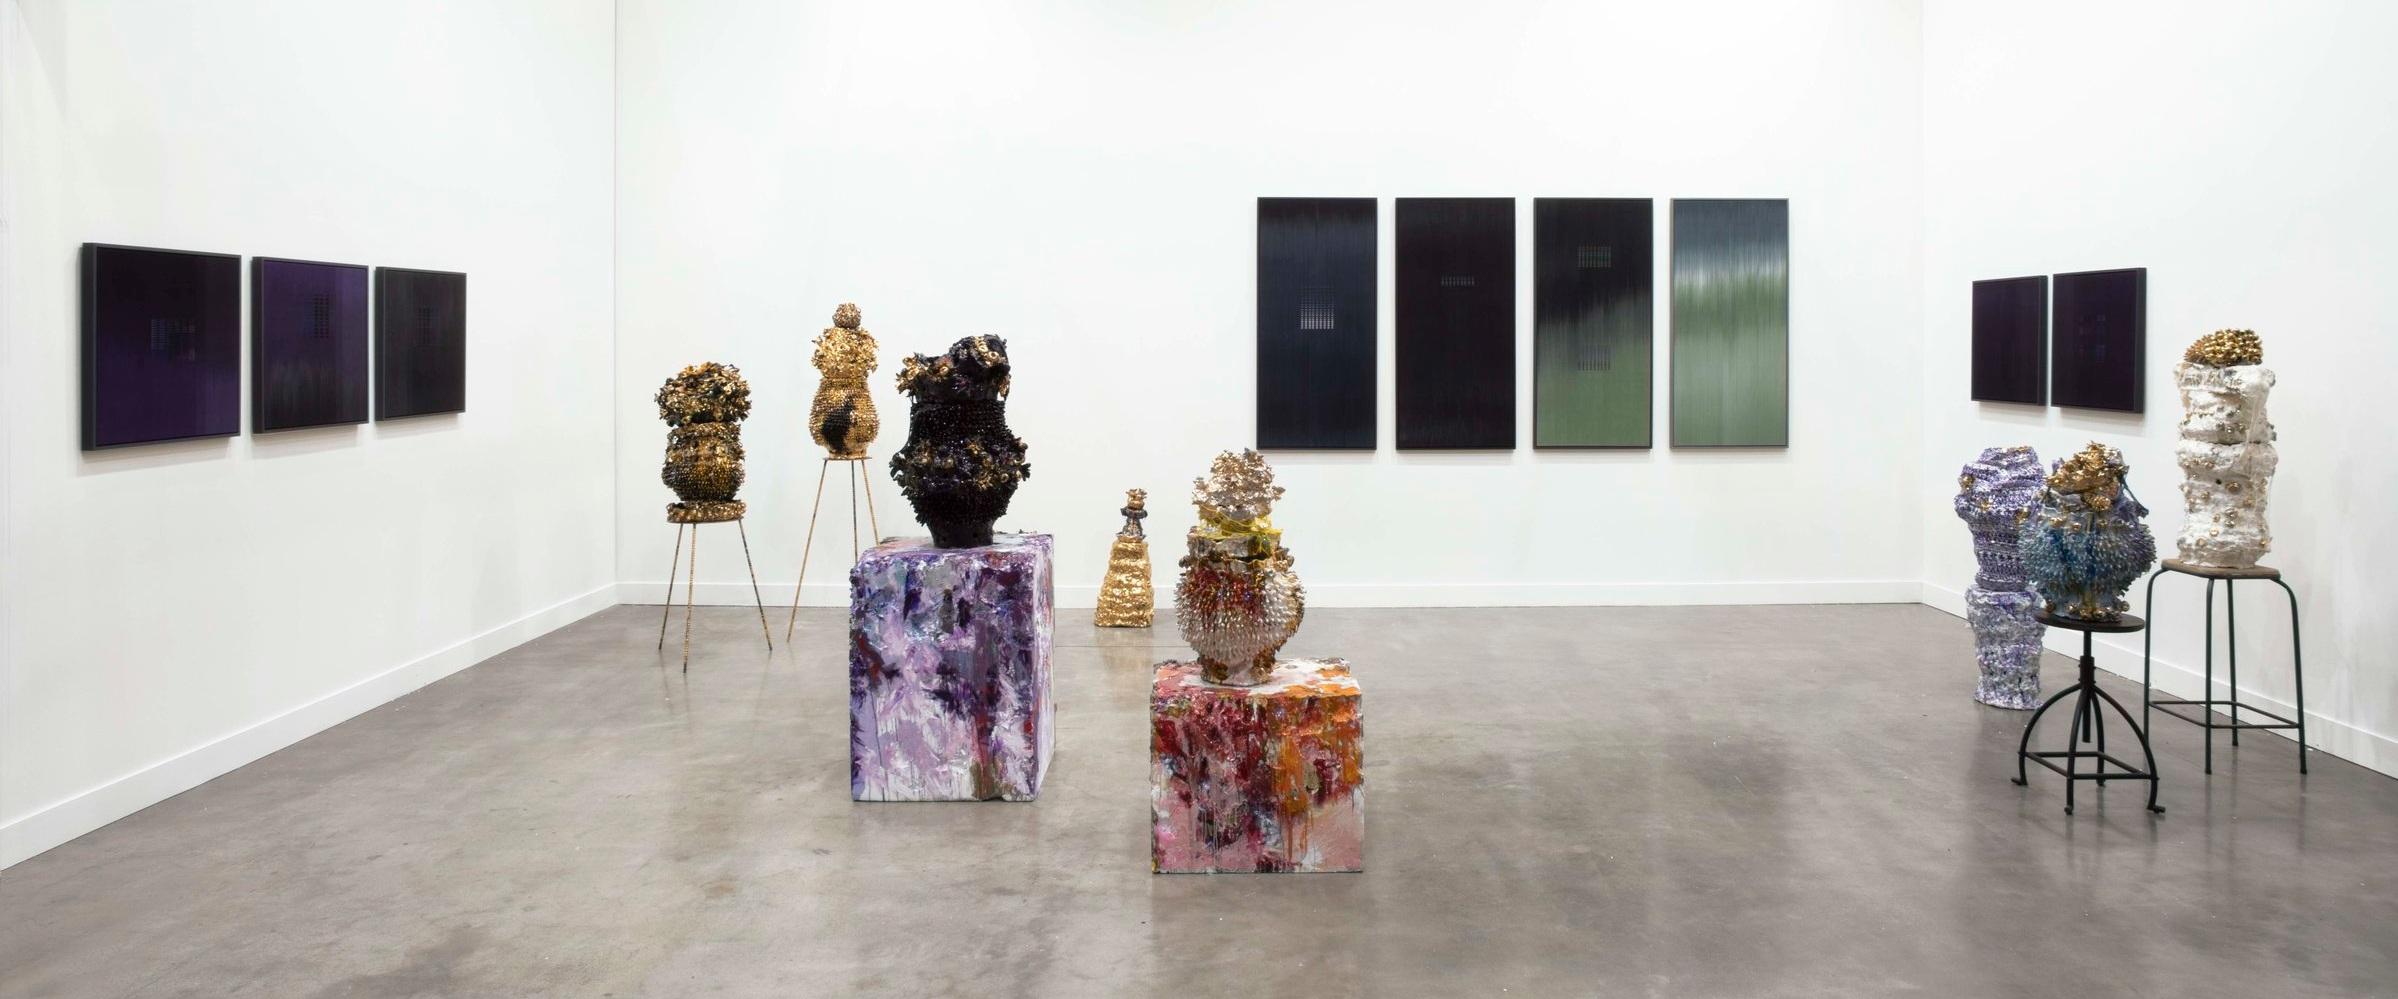 MIART 2019 Exhibition | Taste Contemporary